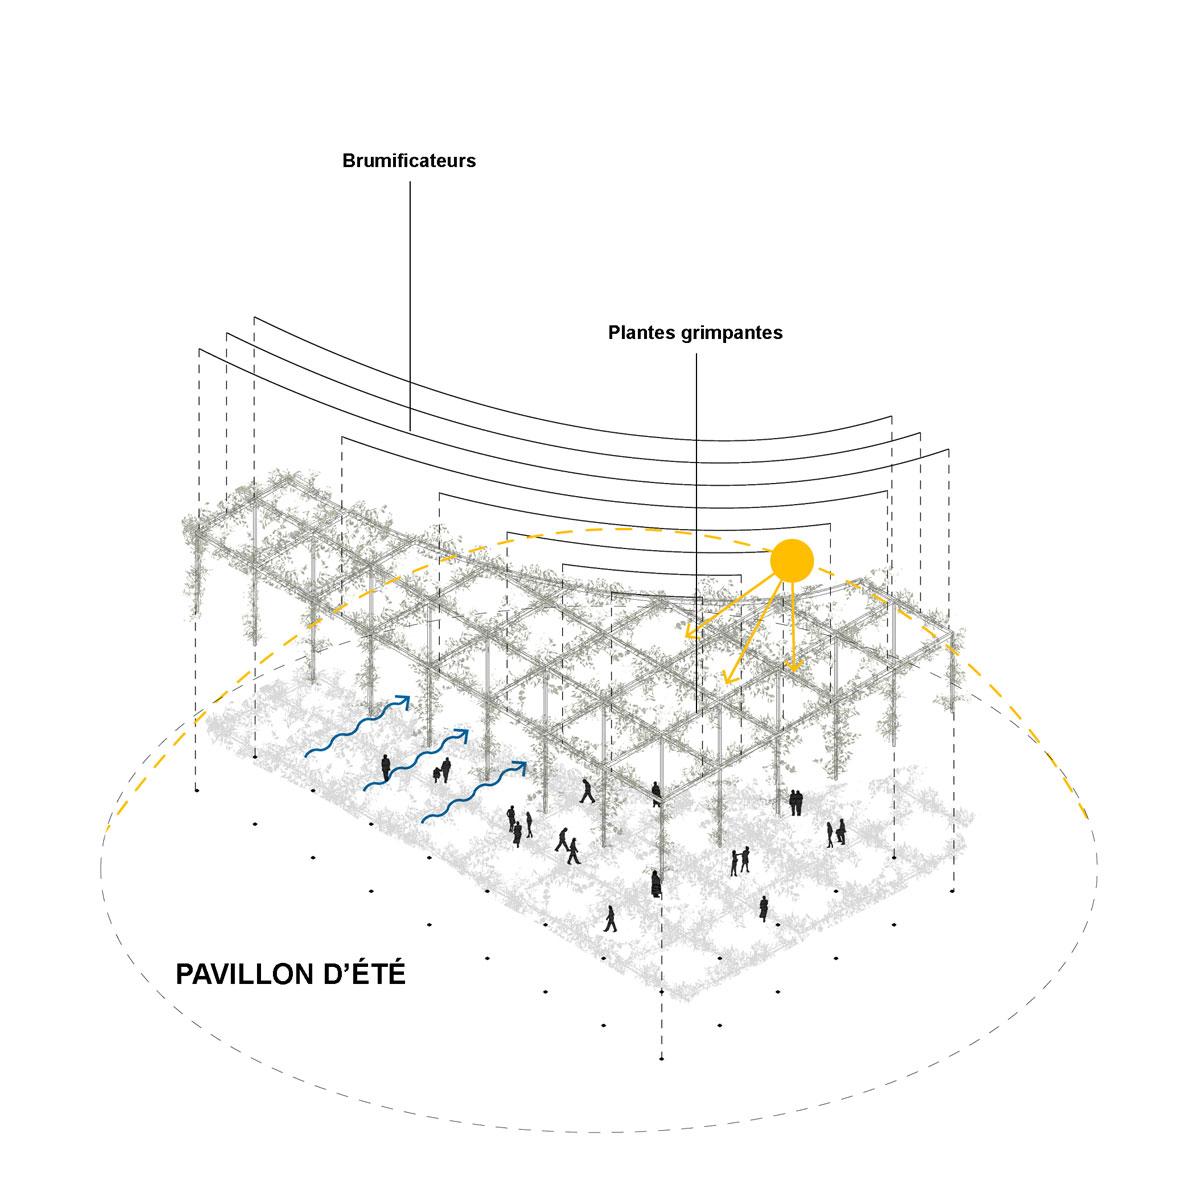 Pelletier-de-Fontenay-Bureau-Bas-Smets_PDM_02_axo_web.jpg